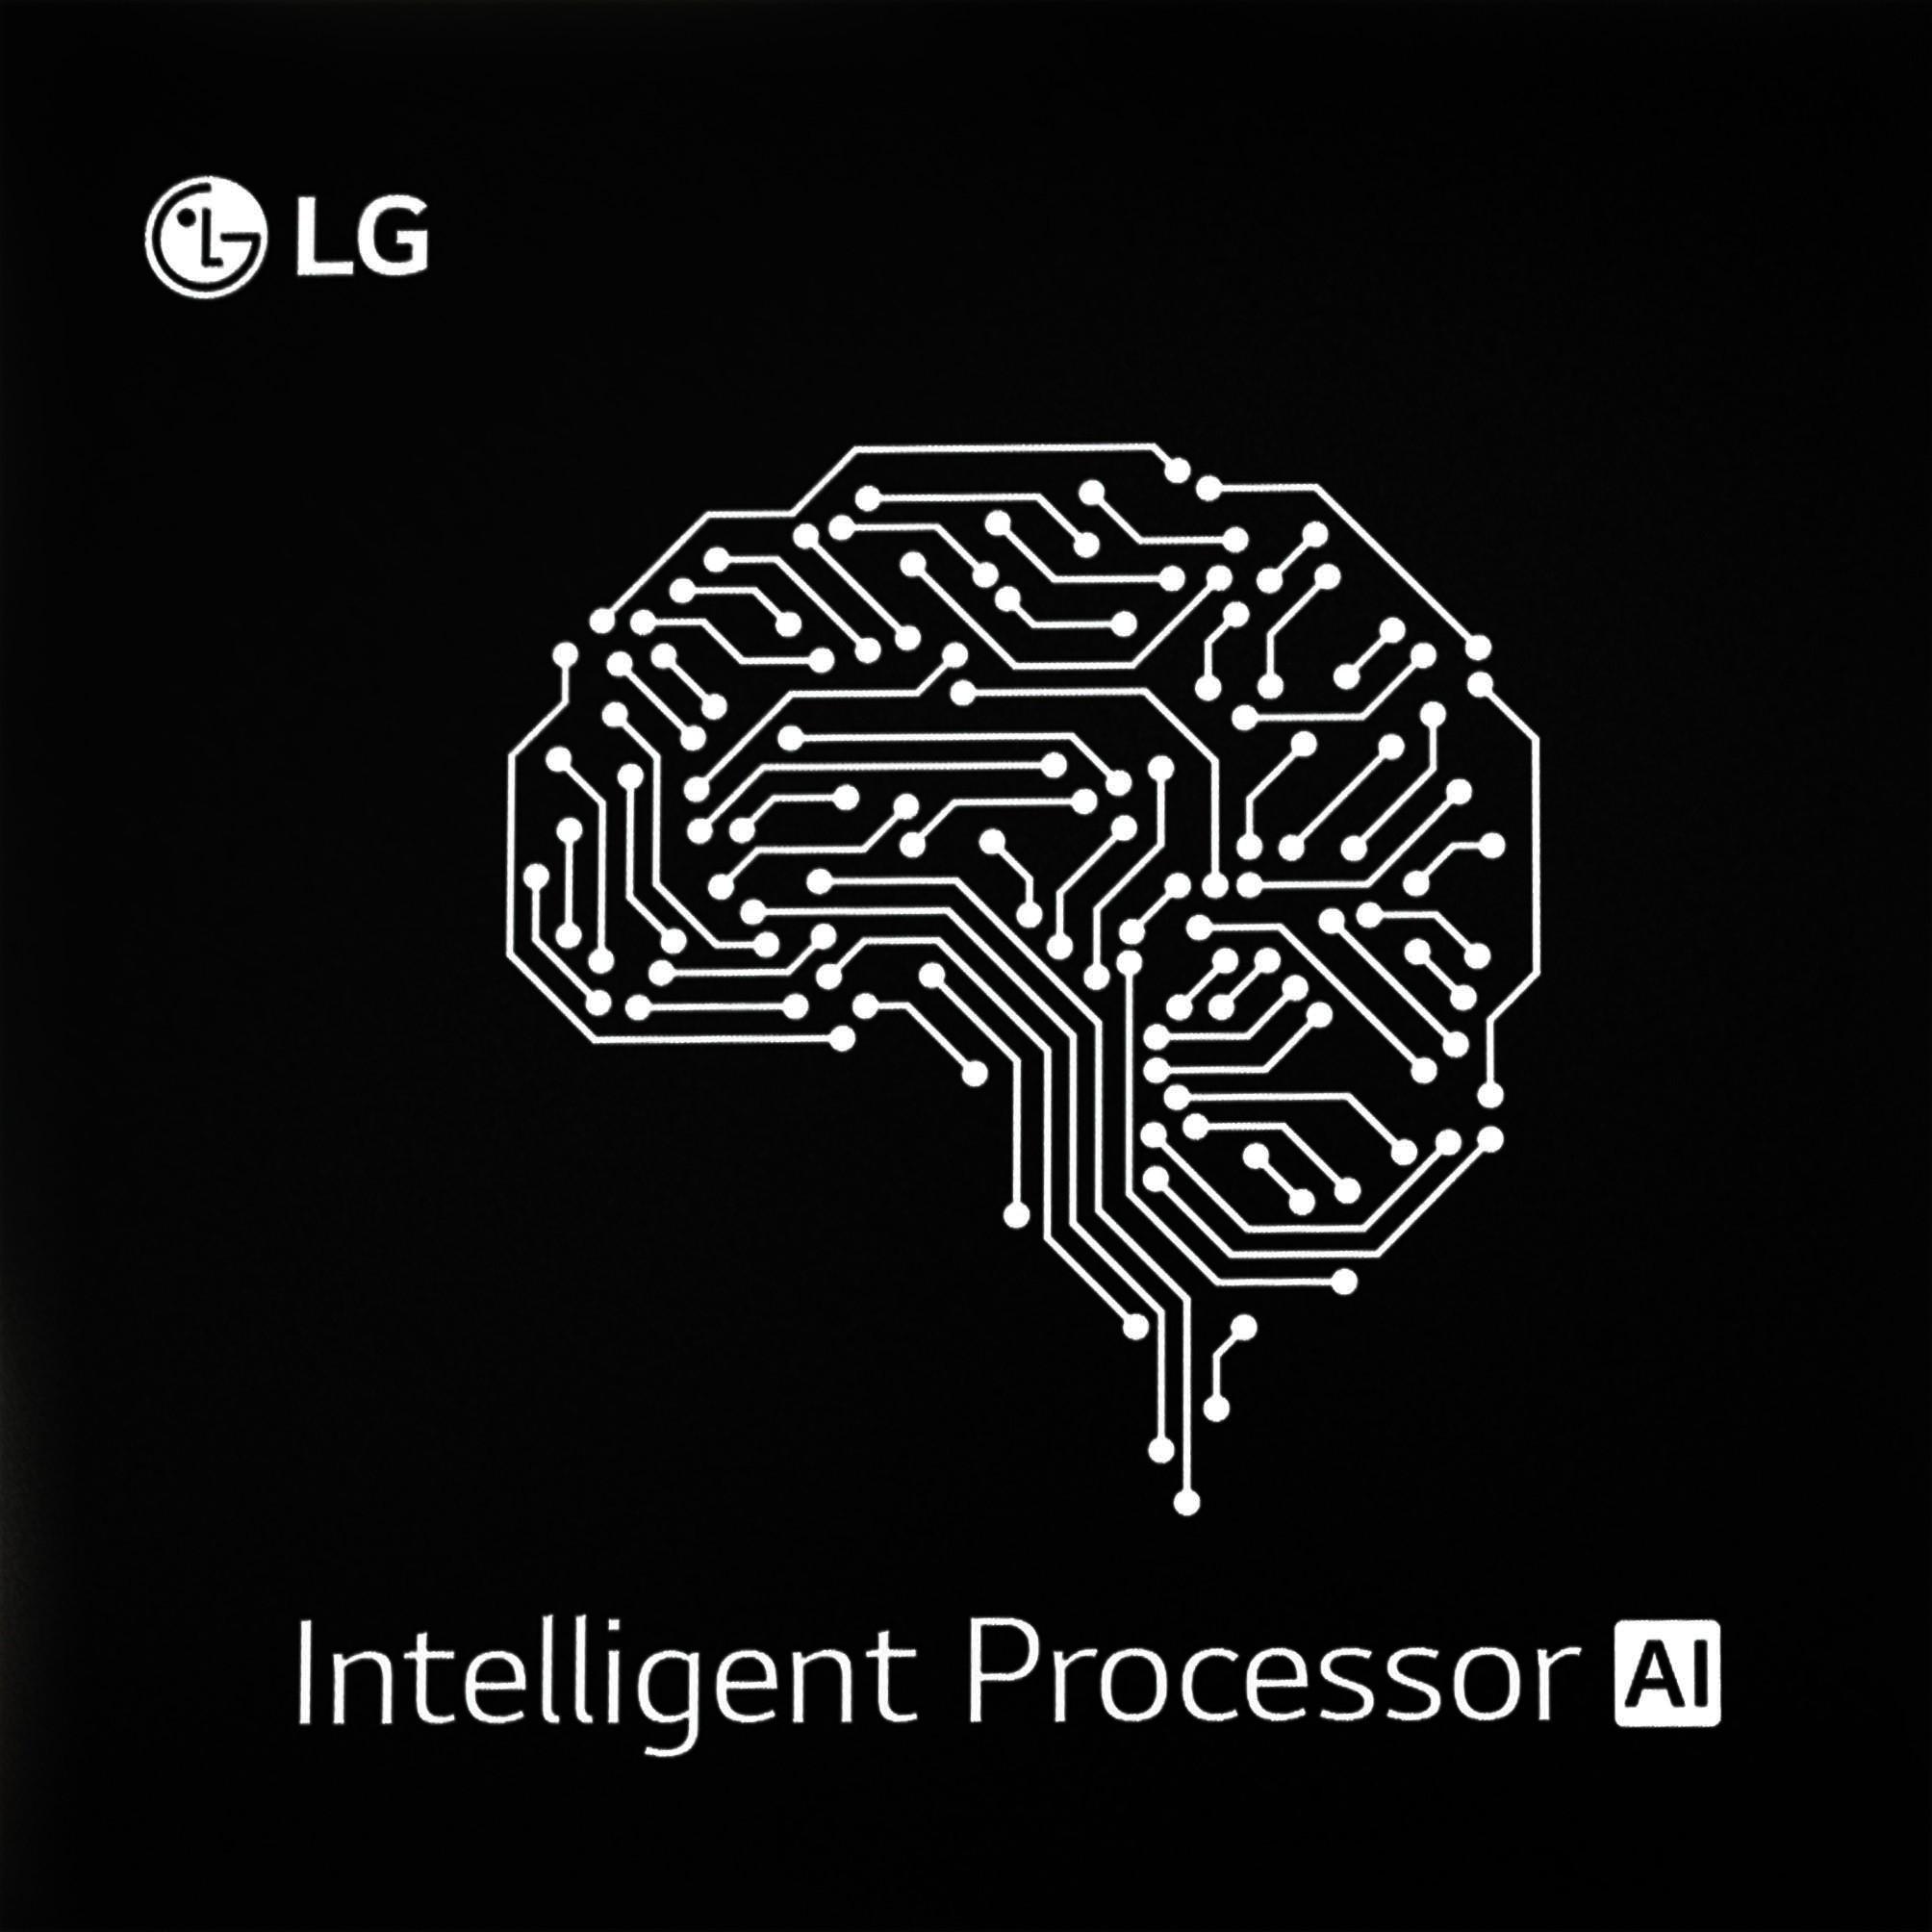 The logo of LG's Intelligent Processor AI Chip.